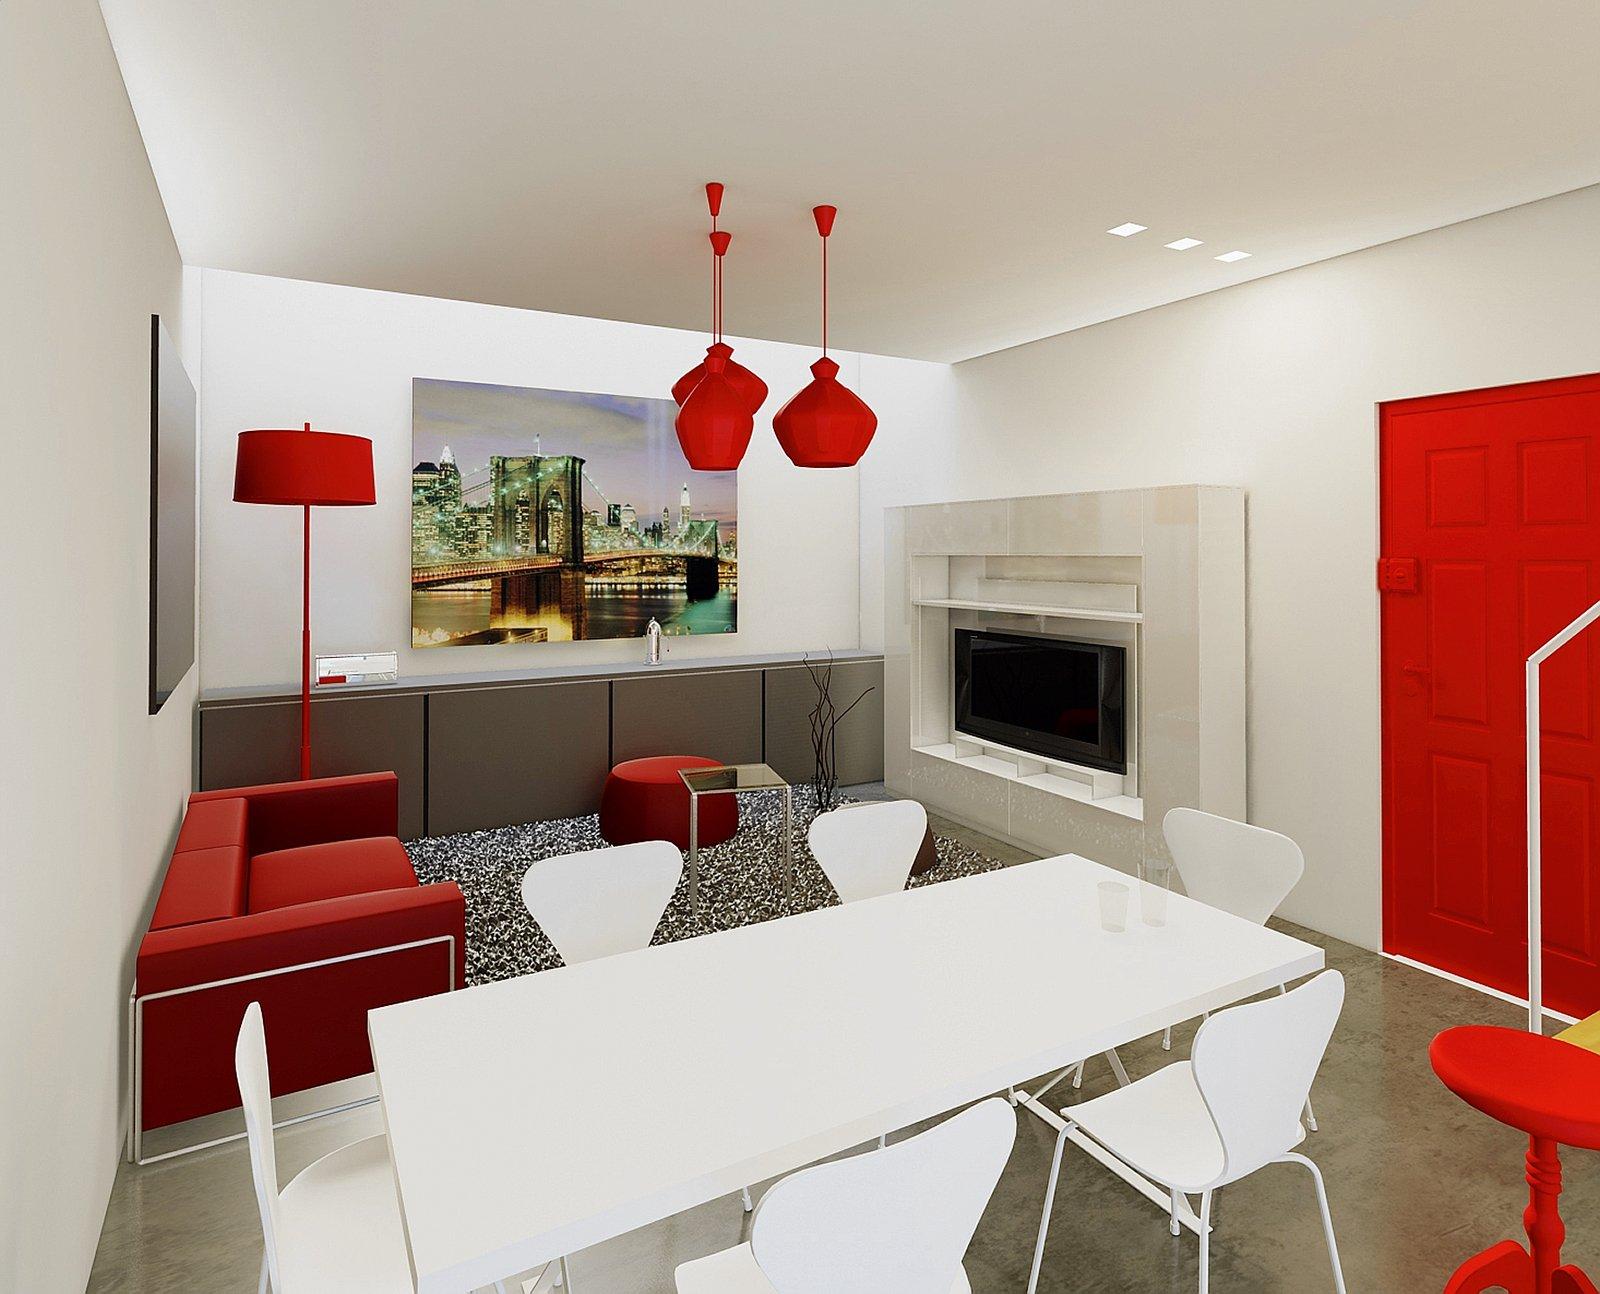 Pi luce 10 idee per moltiplicarla cose di casa - Idee pittura pareti ...